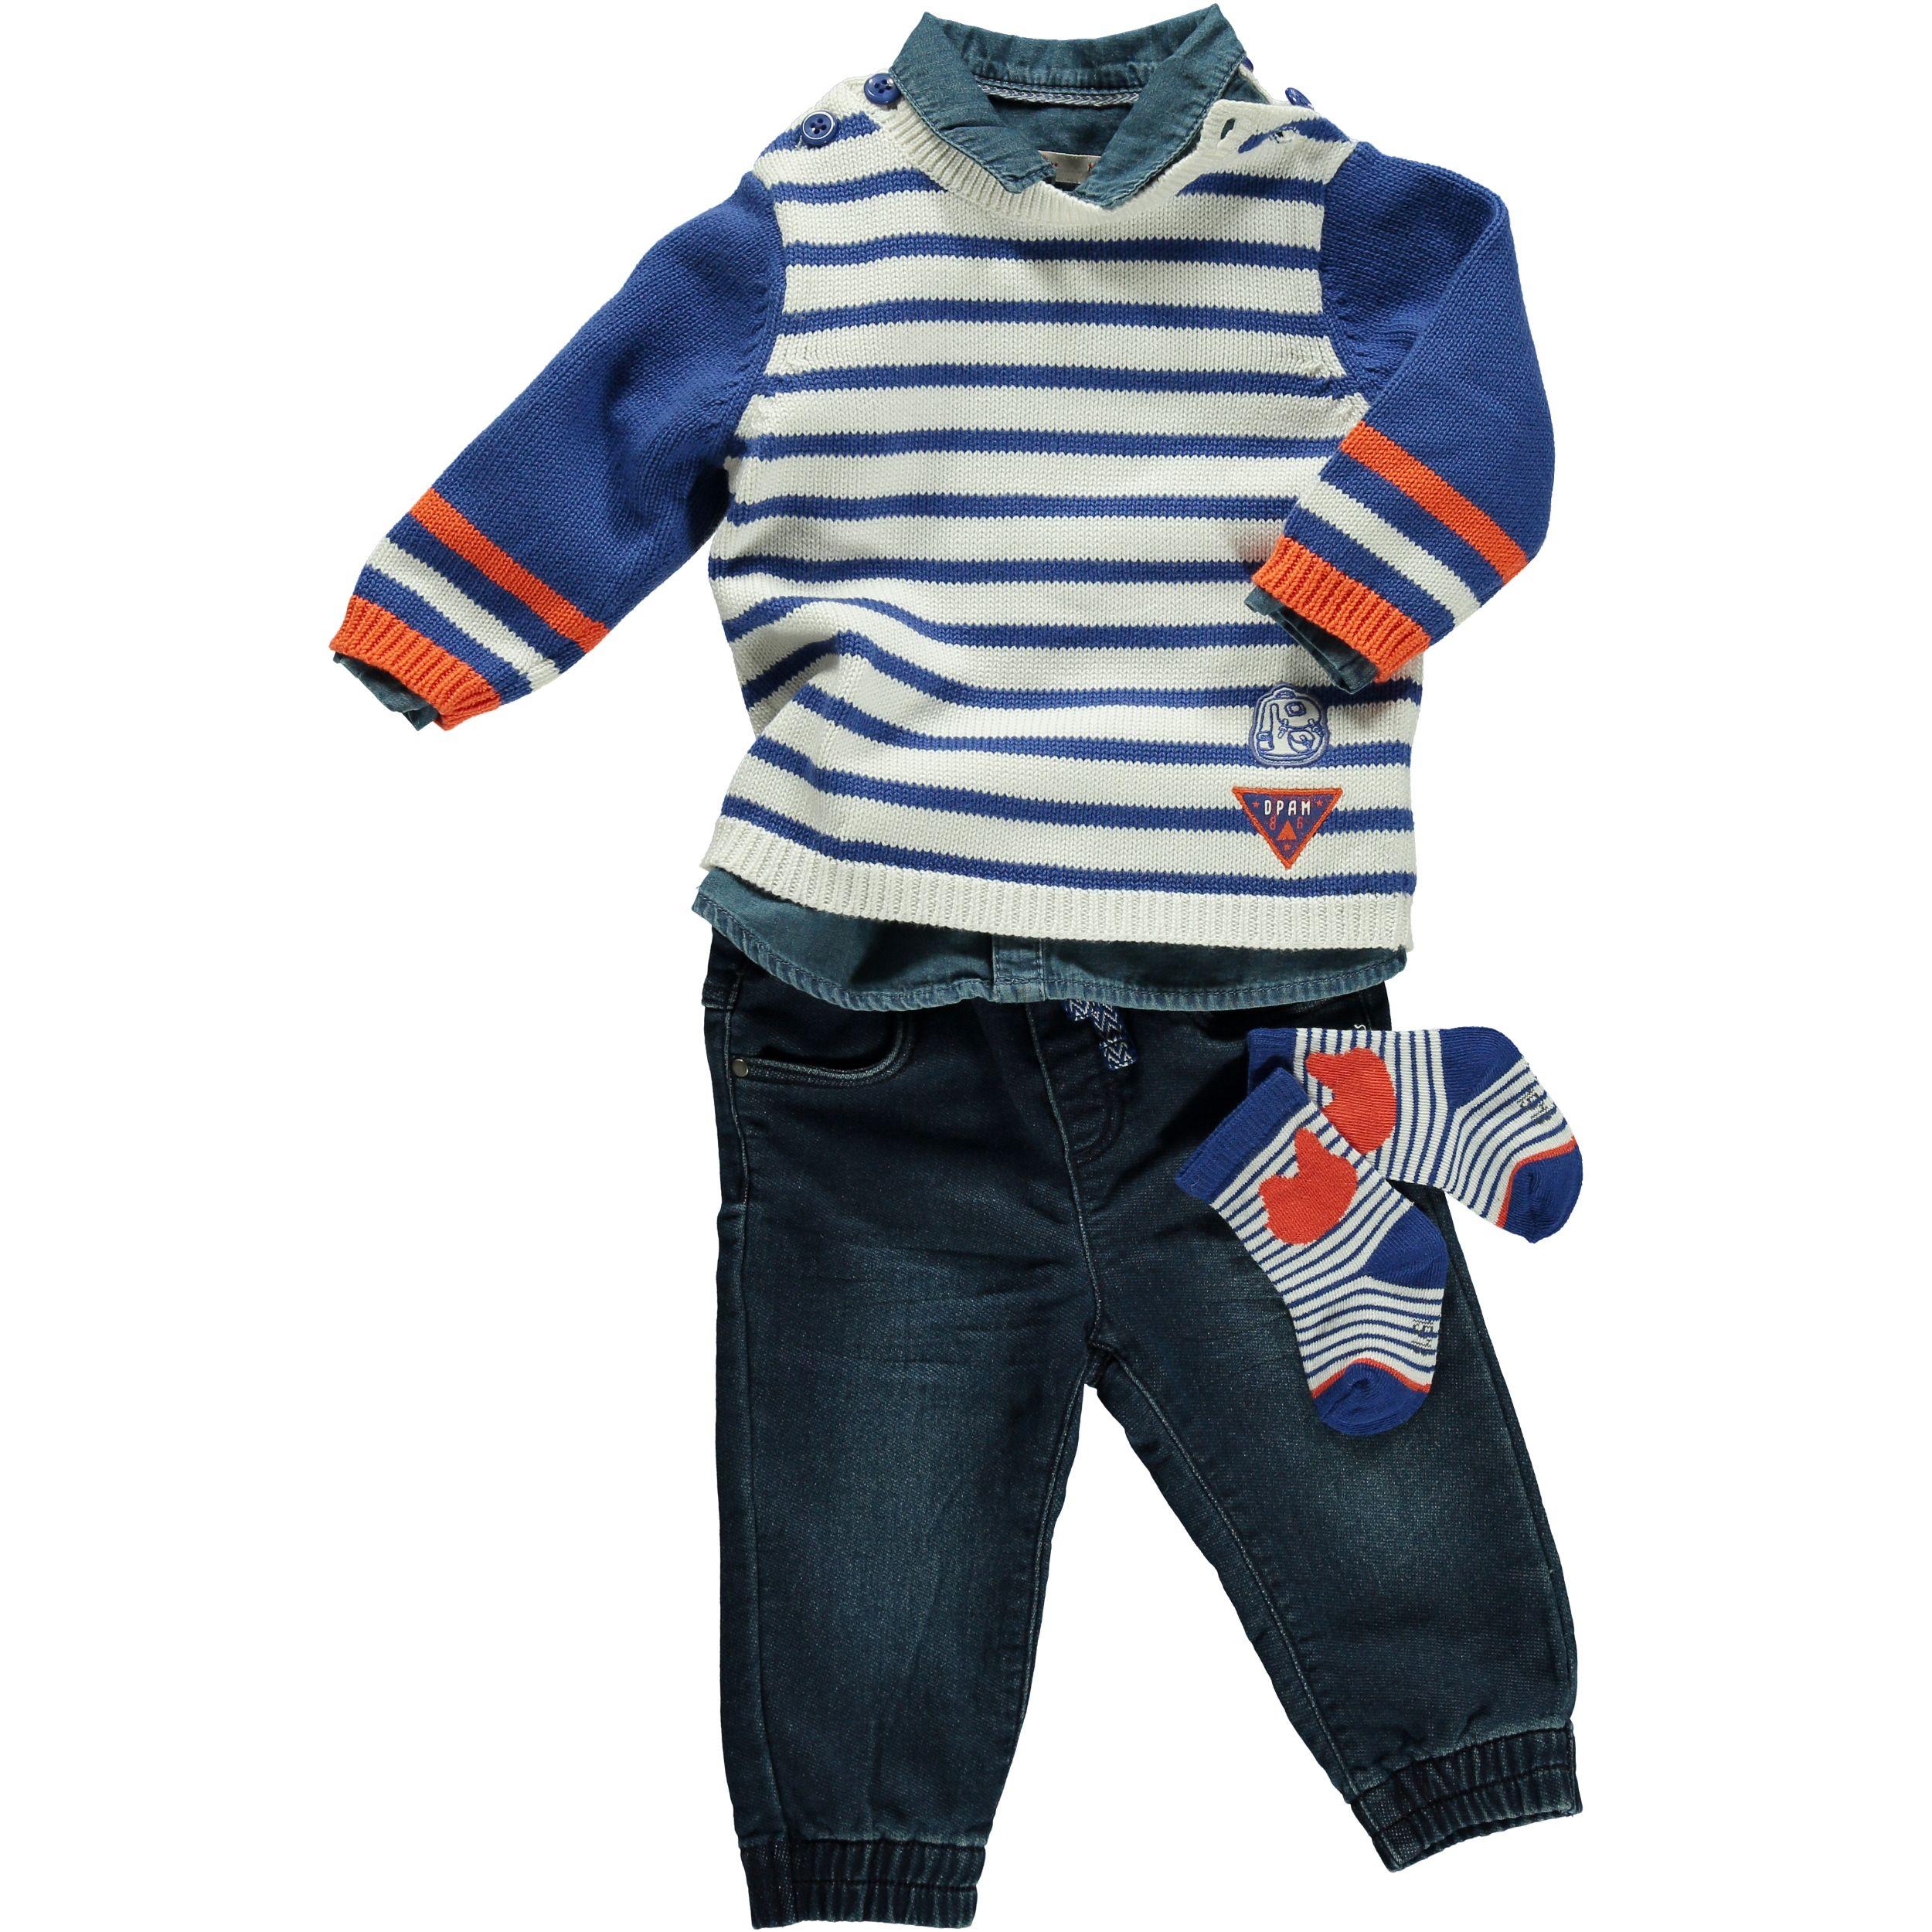 61c28b36e5f49  dpam  fashion  kid  boy  mode  enfant  garçon  outfit  ootd  collection   ete  printemps  summer  spring  rock  lake